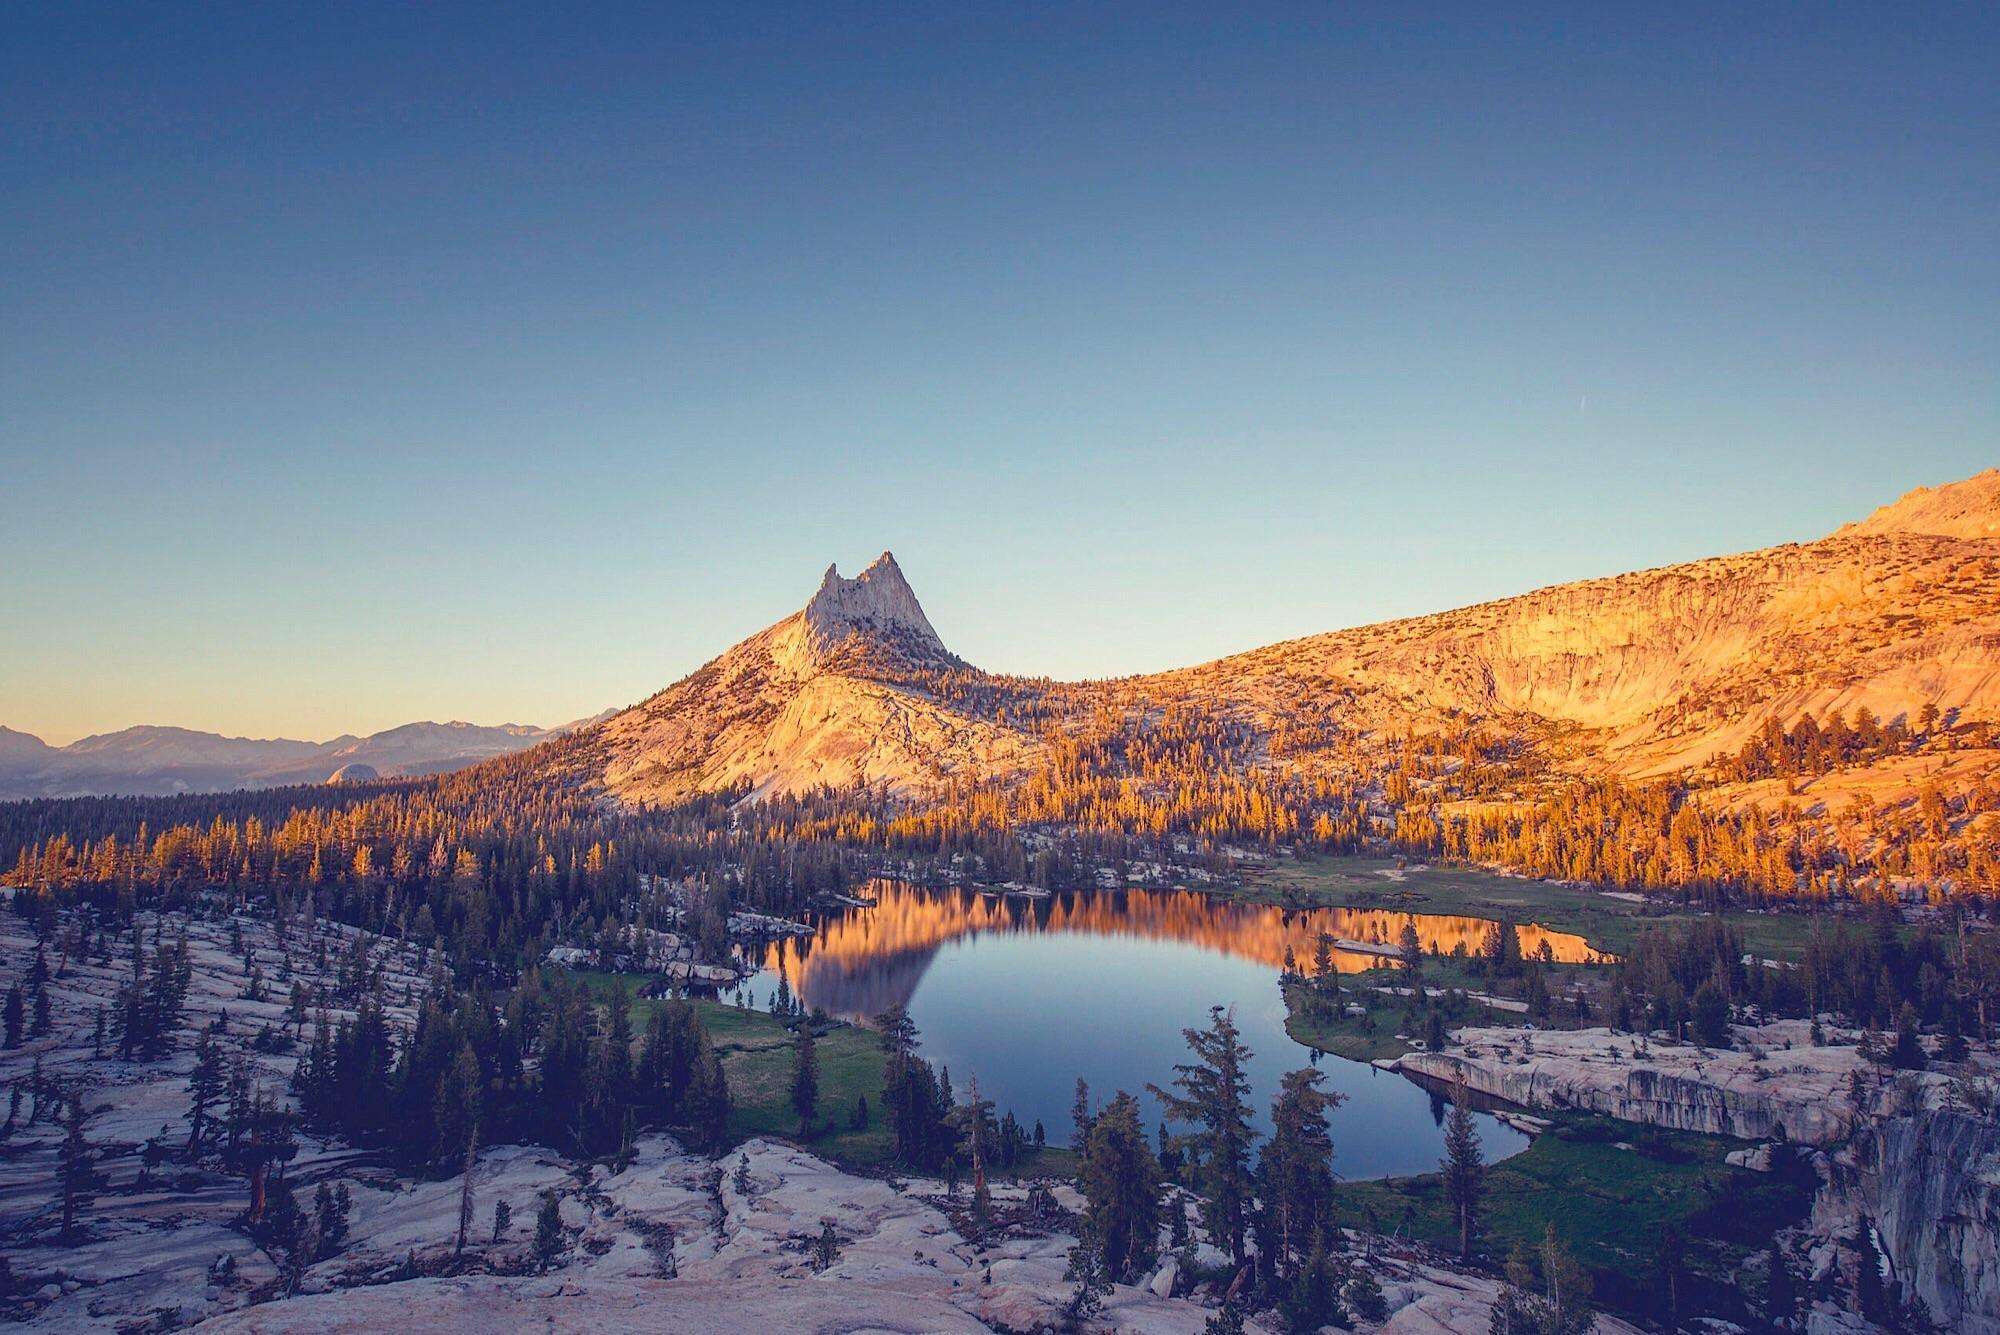 Cathedral lakes Tuolumne Meadows YosemiteCA OC [2000x1335]